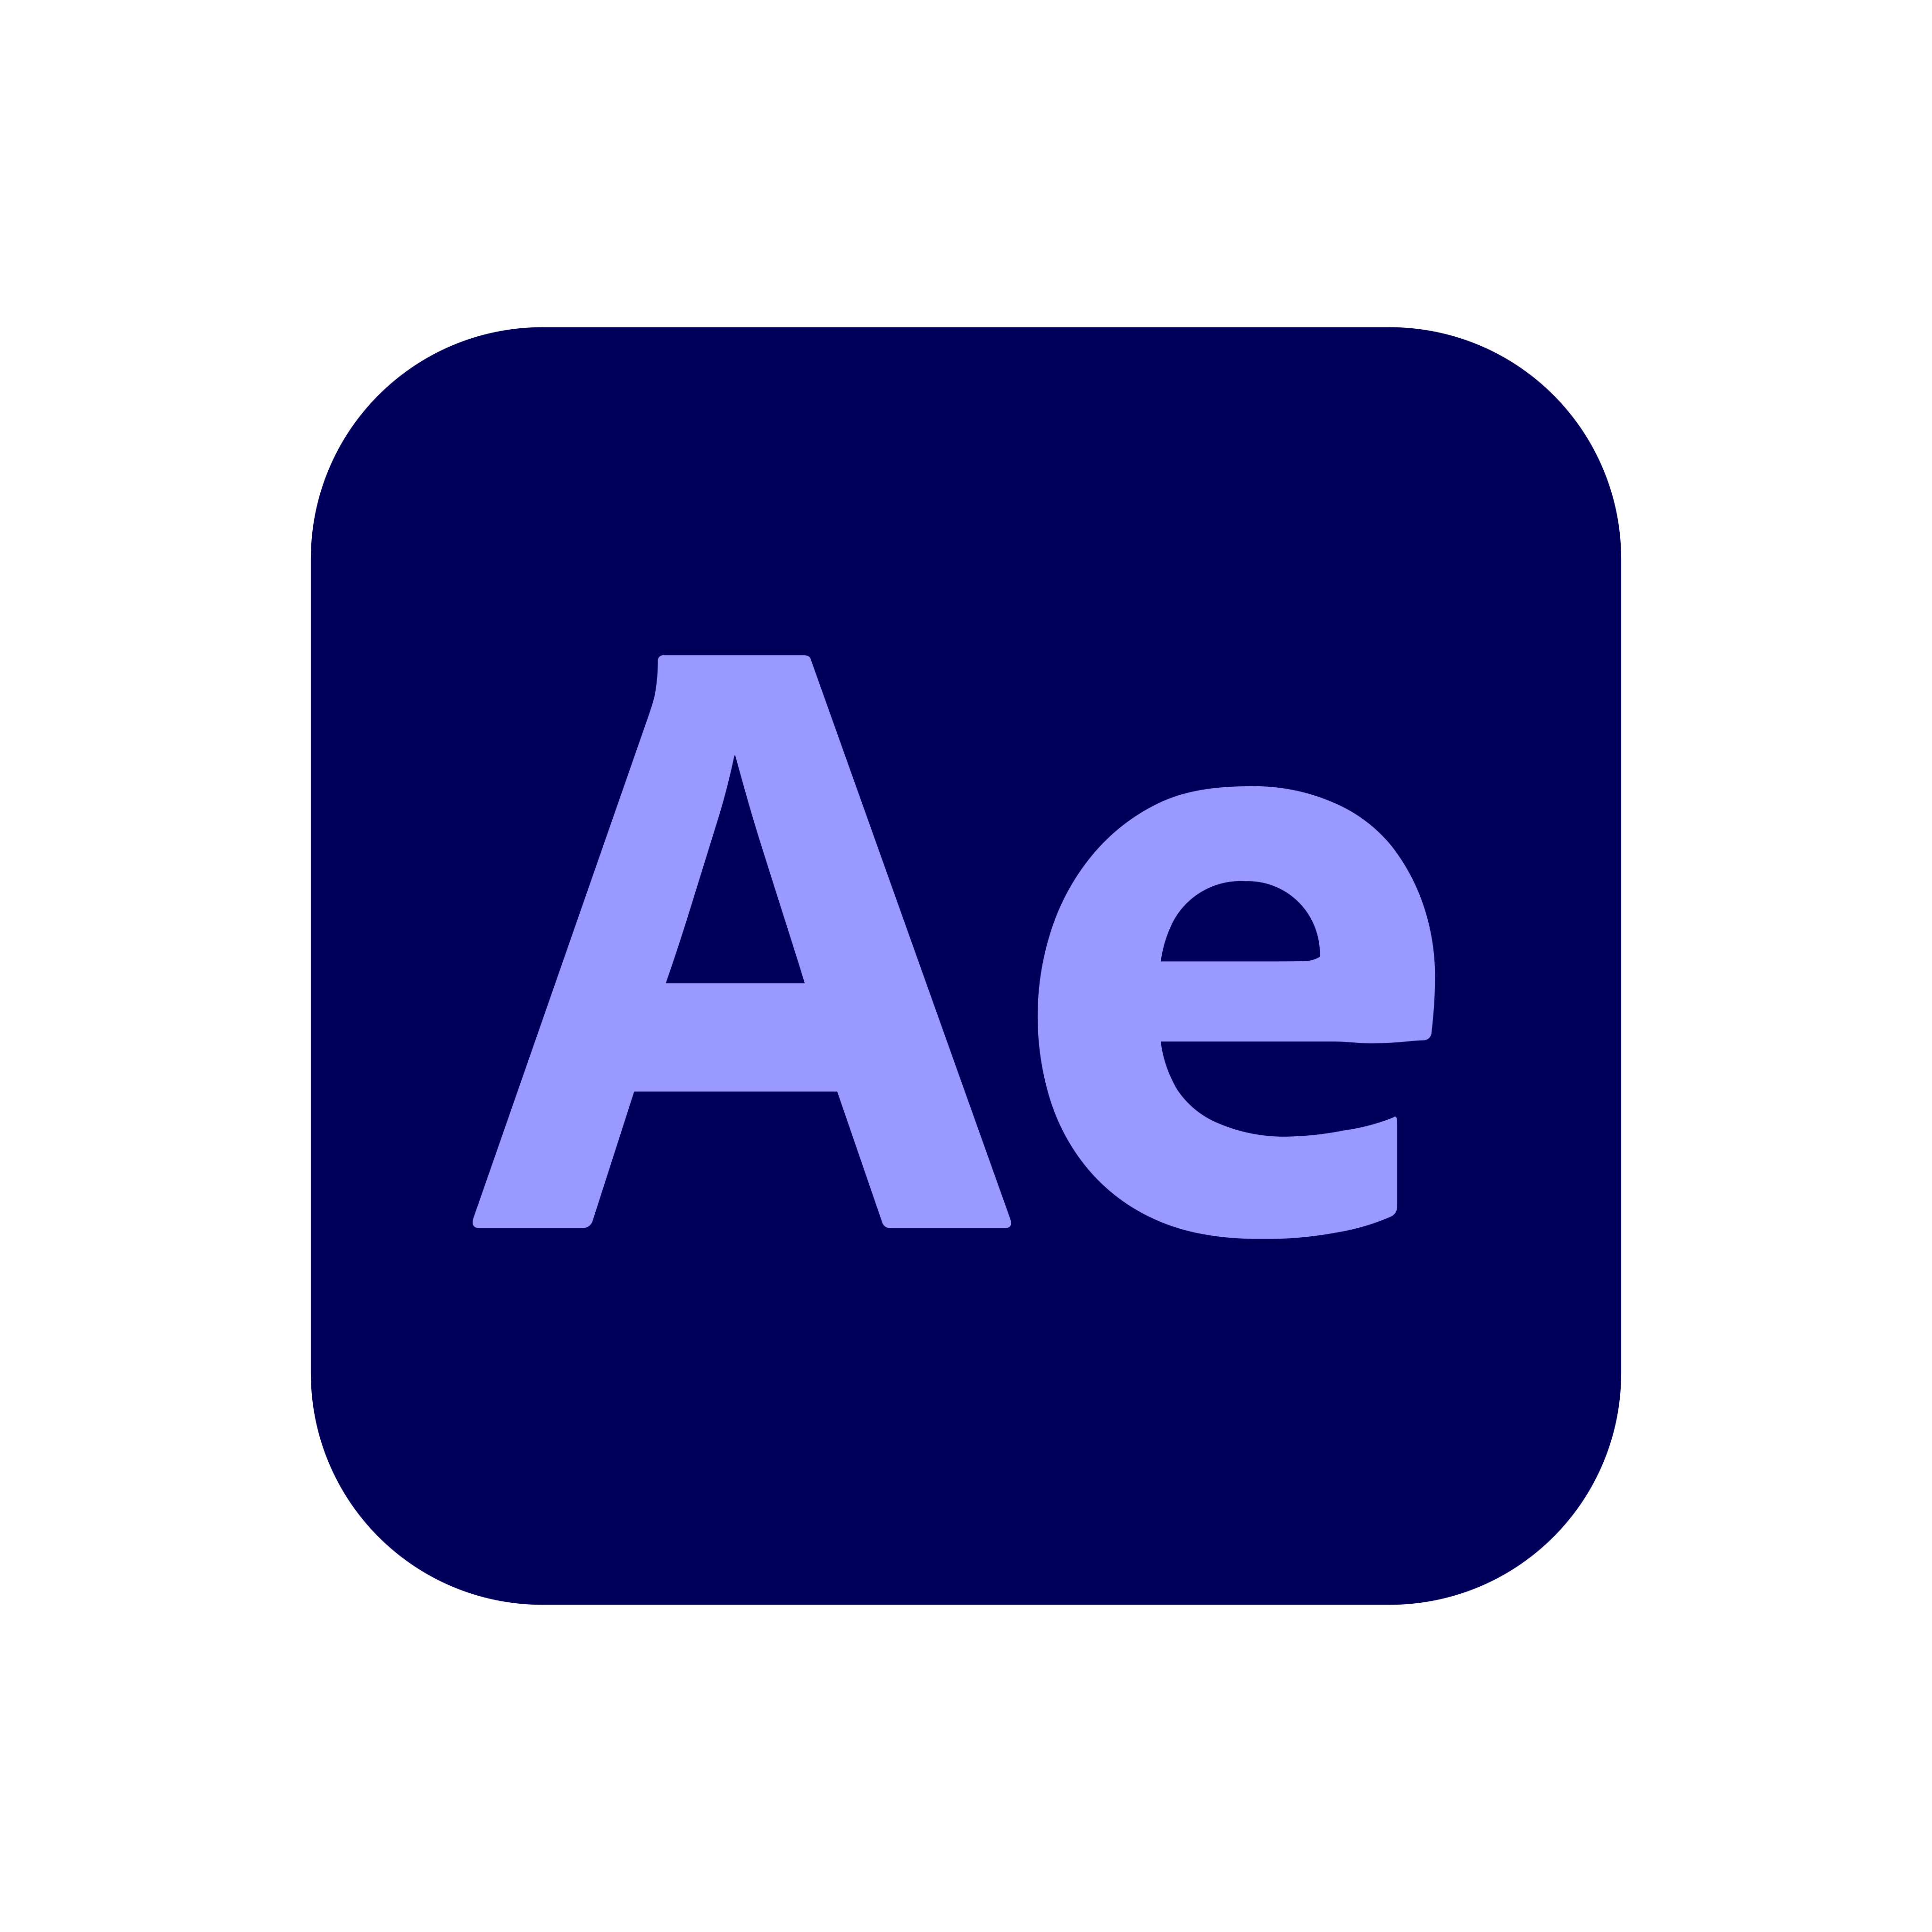 adobe after effects logo 0 - Adobe After Effects Logo